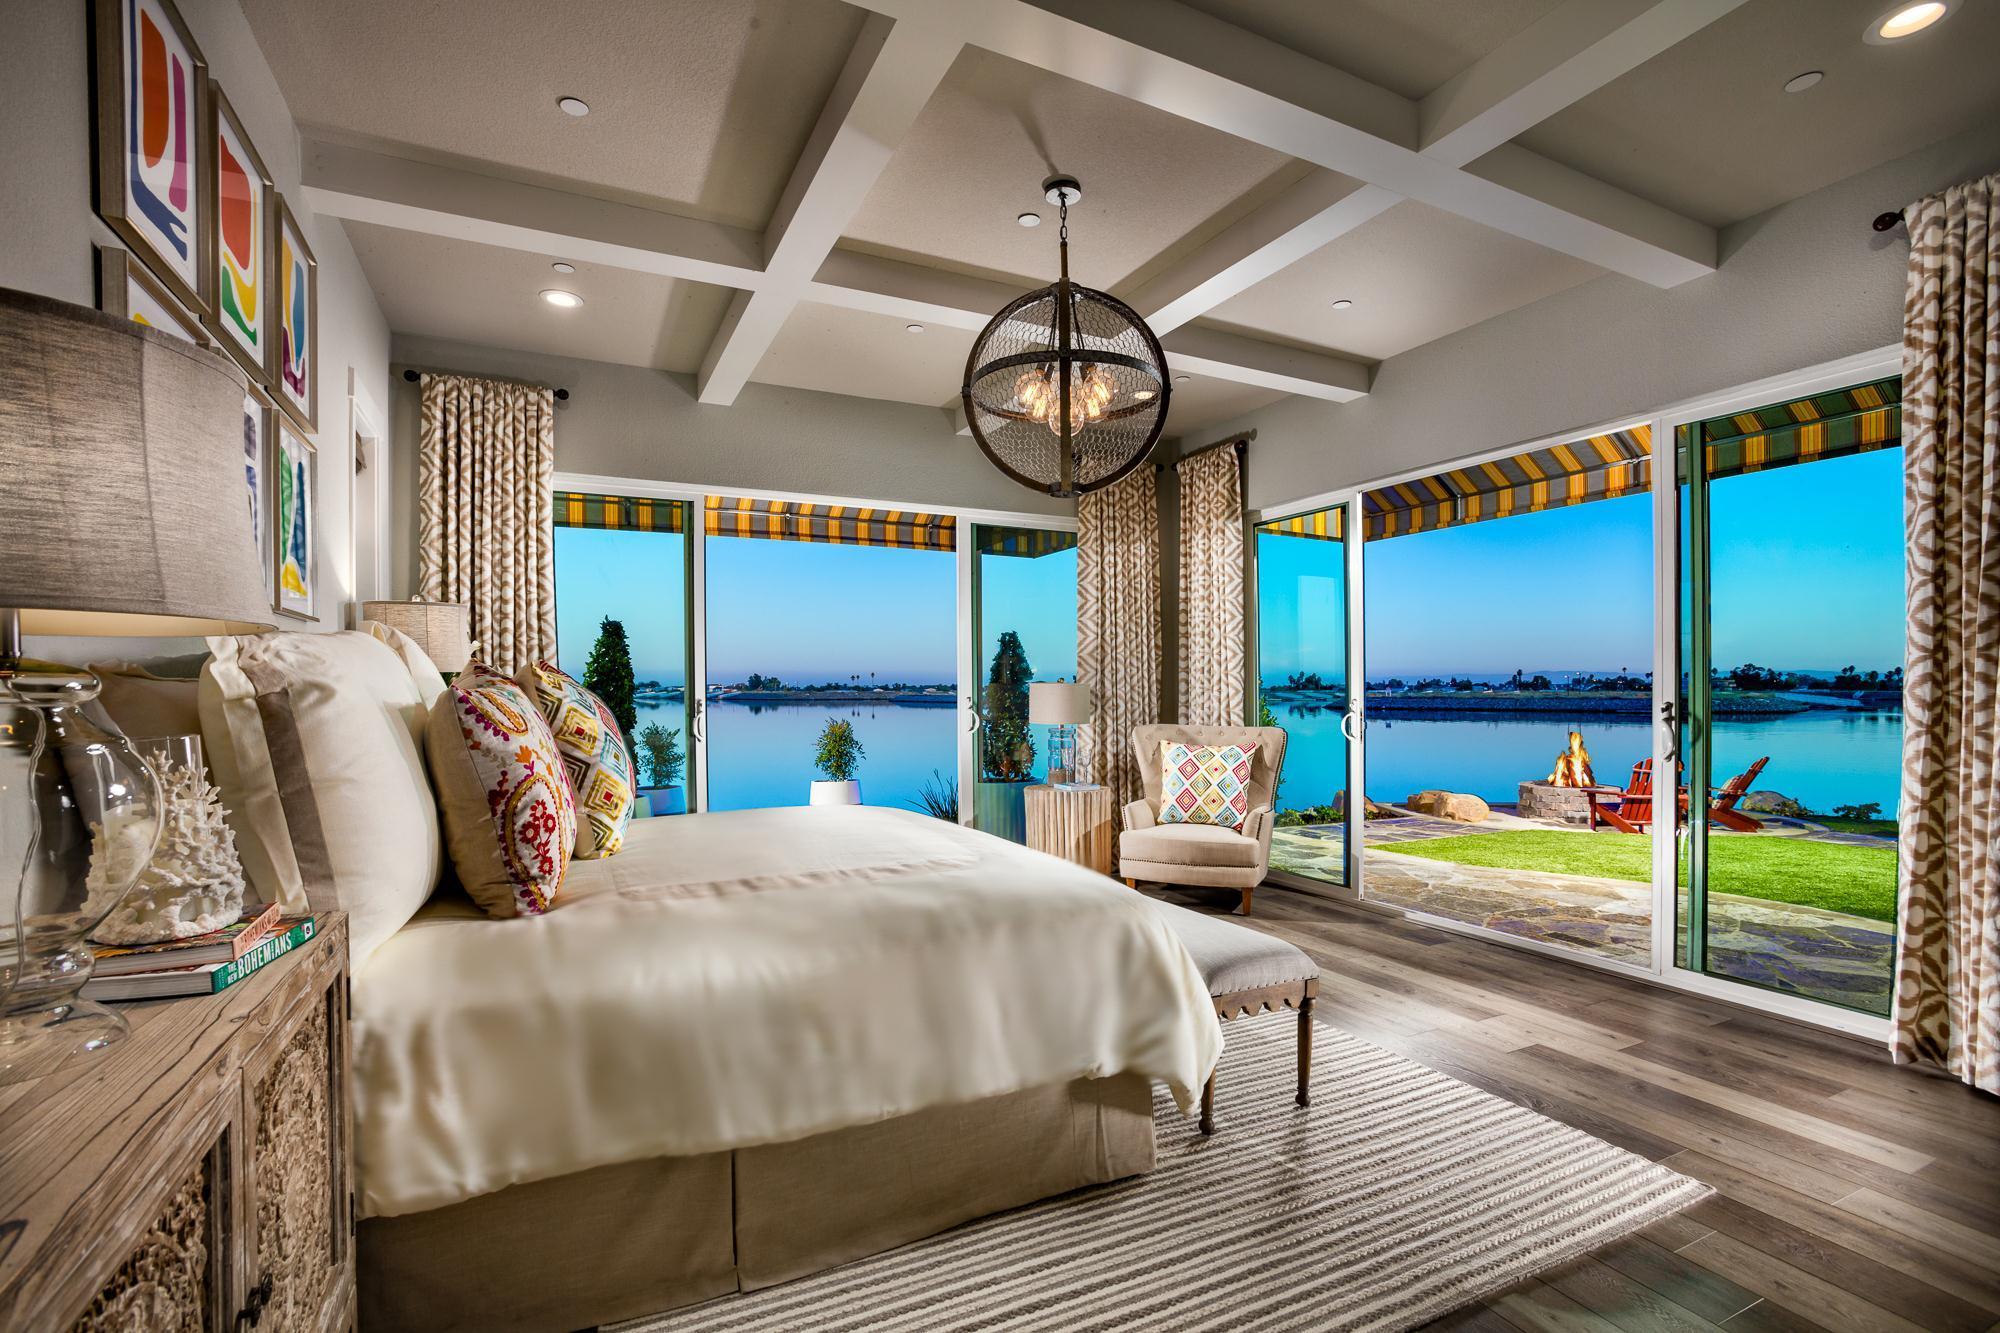 Bedroom featured in The Shoreline By Davidson Communities in Oakland-Alameda, CA